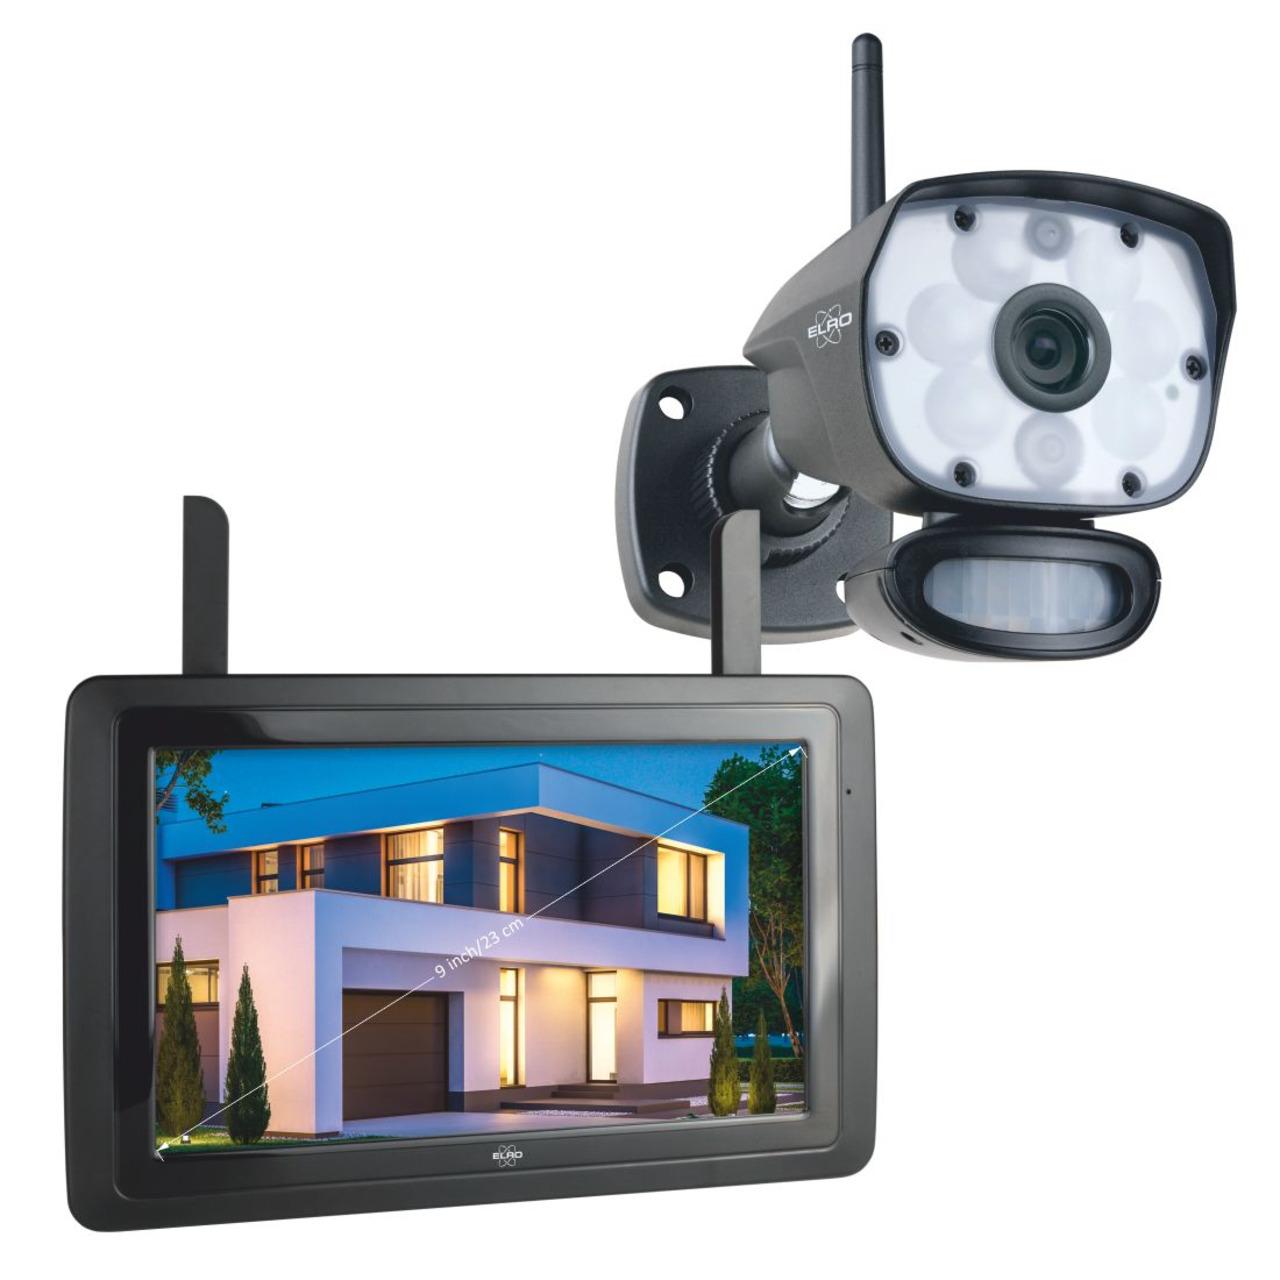 ELRO Funk-Kamerasystem CZ60RIP11S- inkl- Touch-Display (9)- App-Steuerung- 1080p (Full-HD)